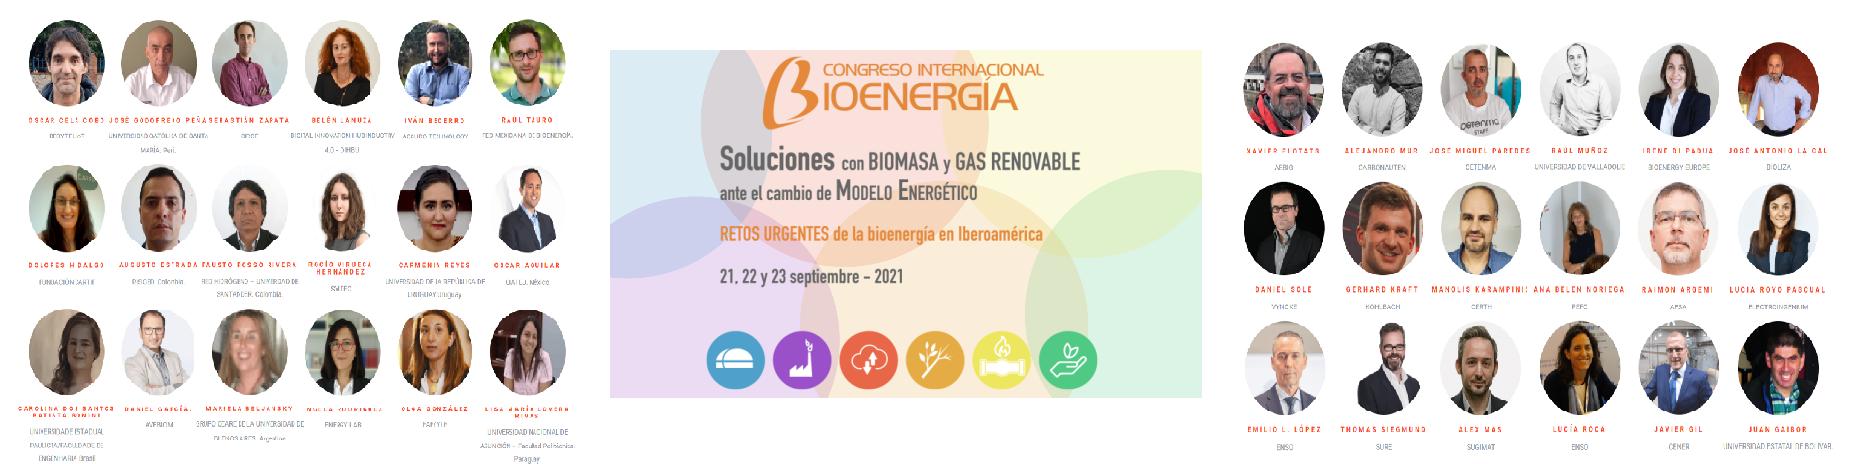 Internationaler Bioenergiekongress